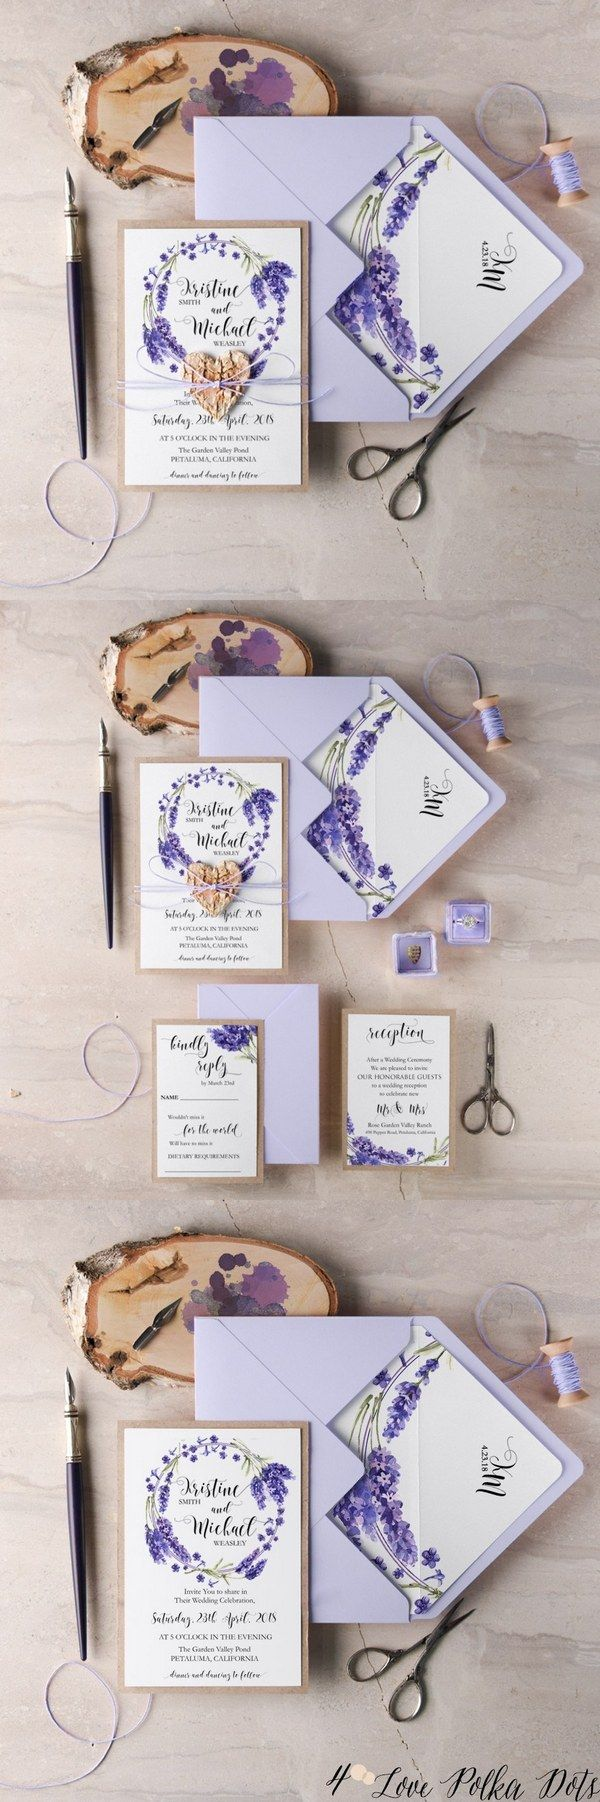 Lavender purple watercolor wedding invitations